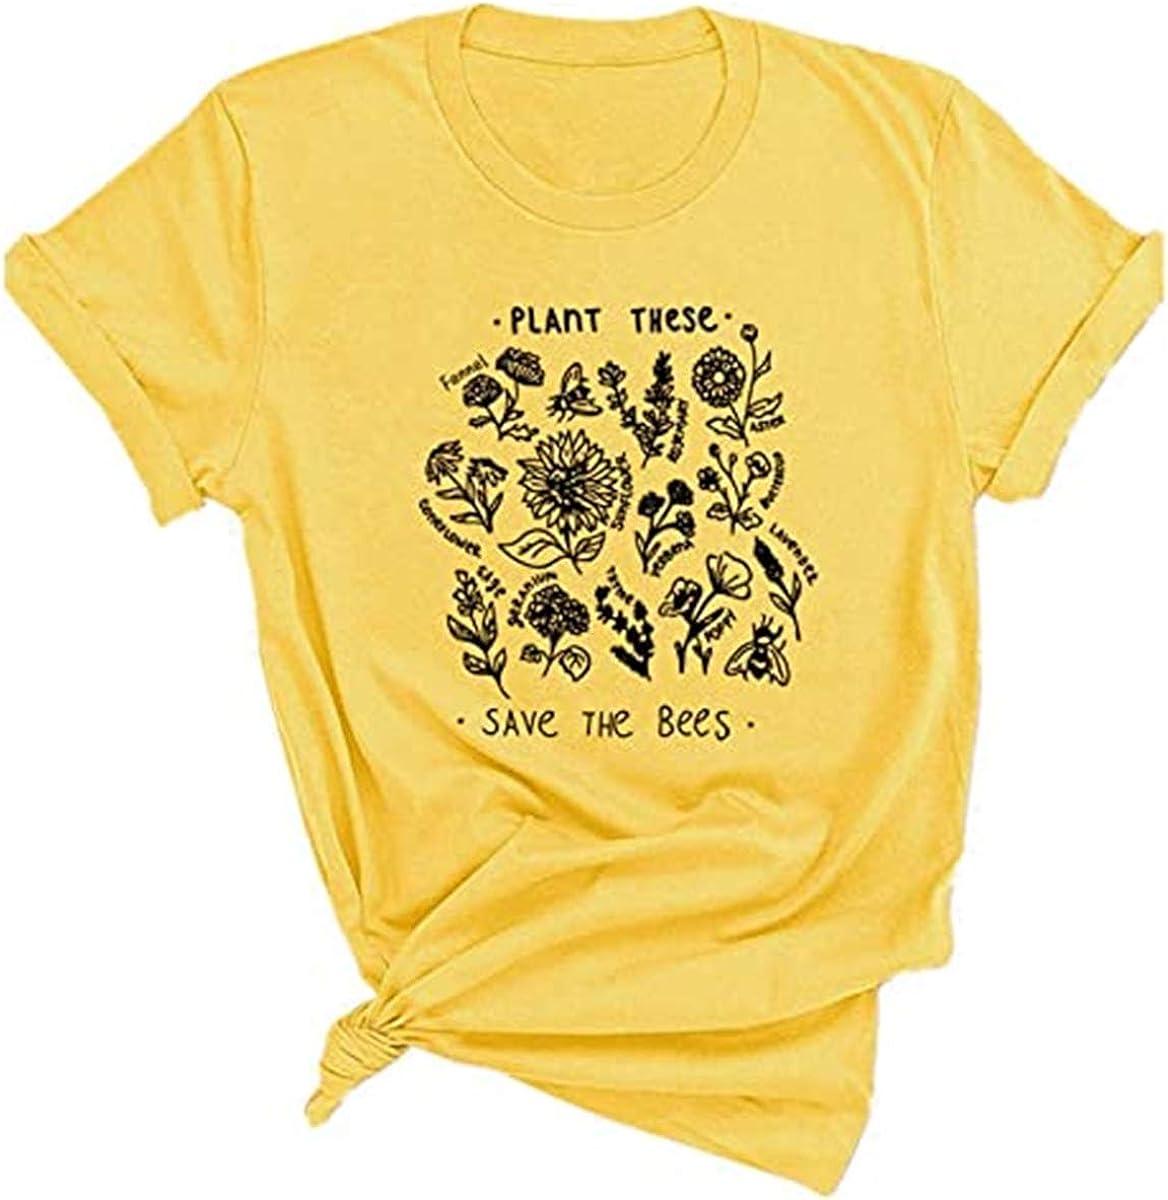 Baron Custom Accessories Letter Printed Shirt Women Flower Graphic Tee Summer